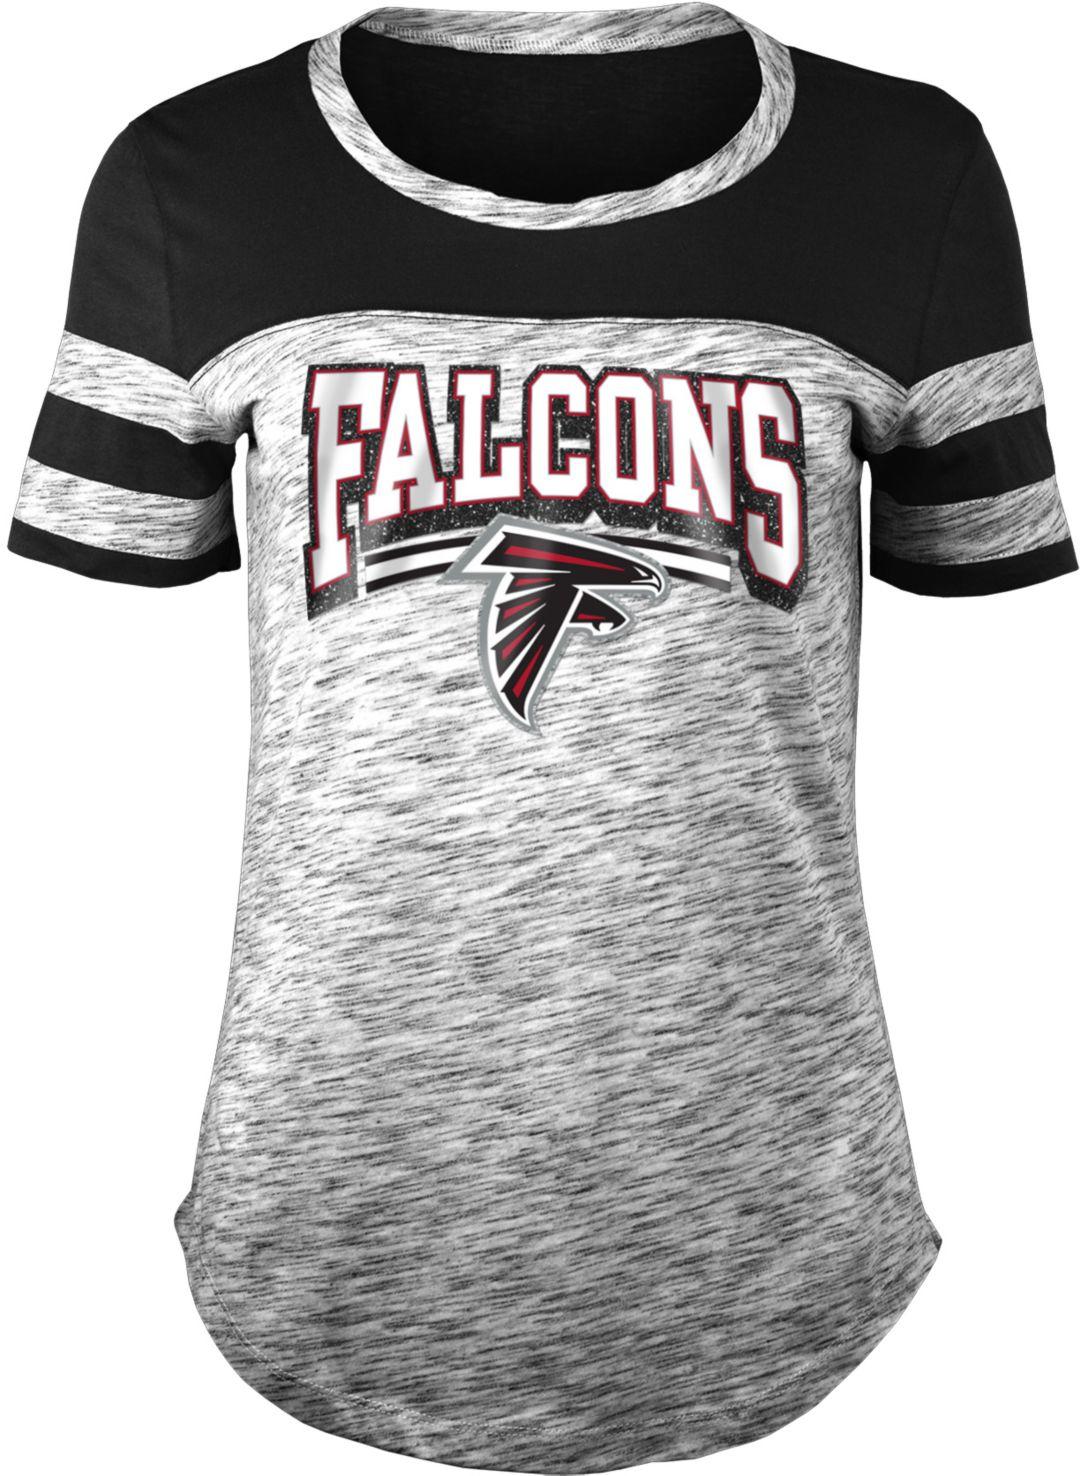 huge selection of 4c9f6 69c0e NFL Team Apparel Women's Atlanta Falcons Space Dye Glitter Black T-Shirt